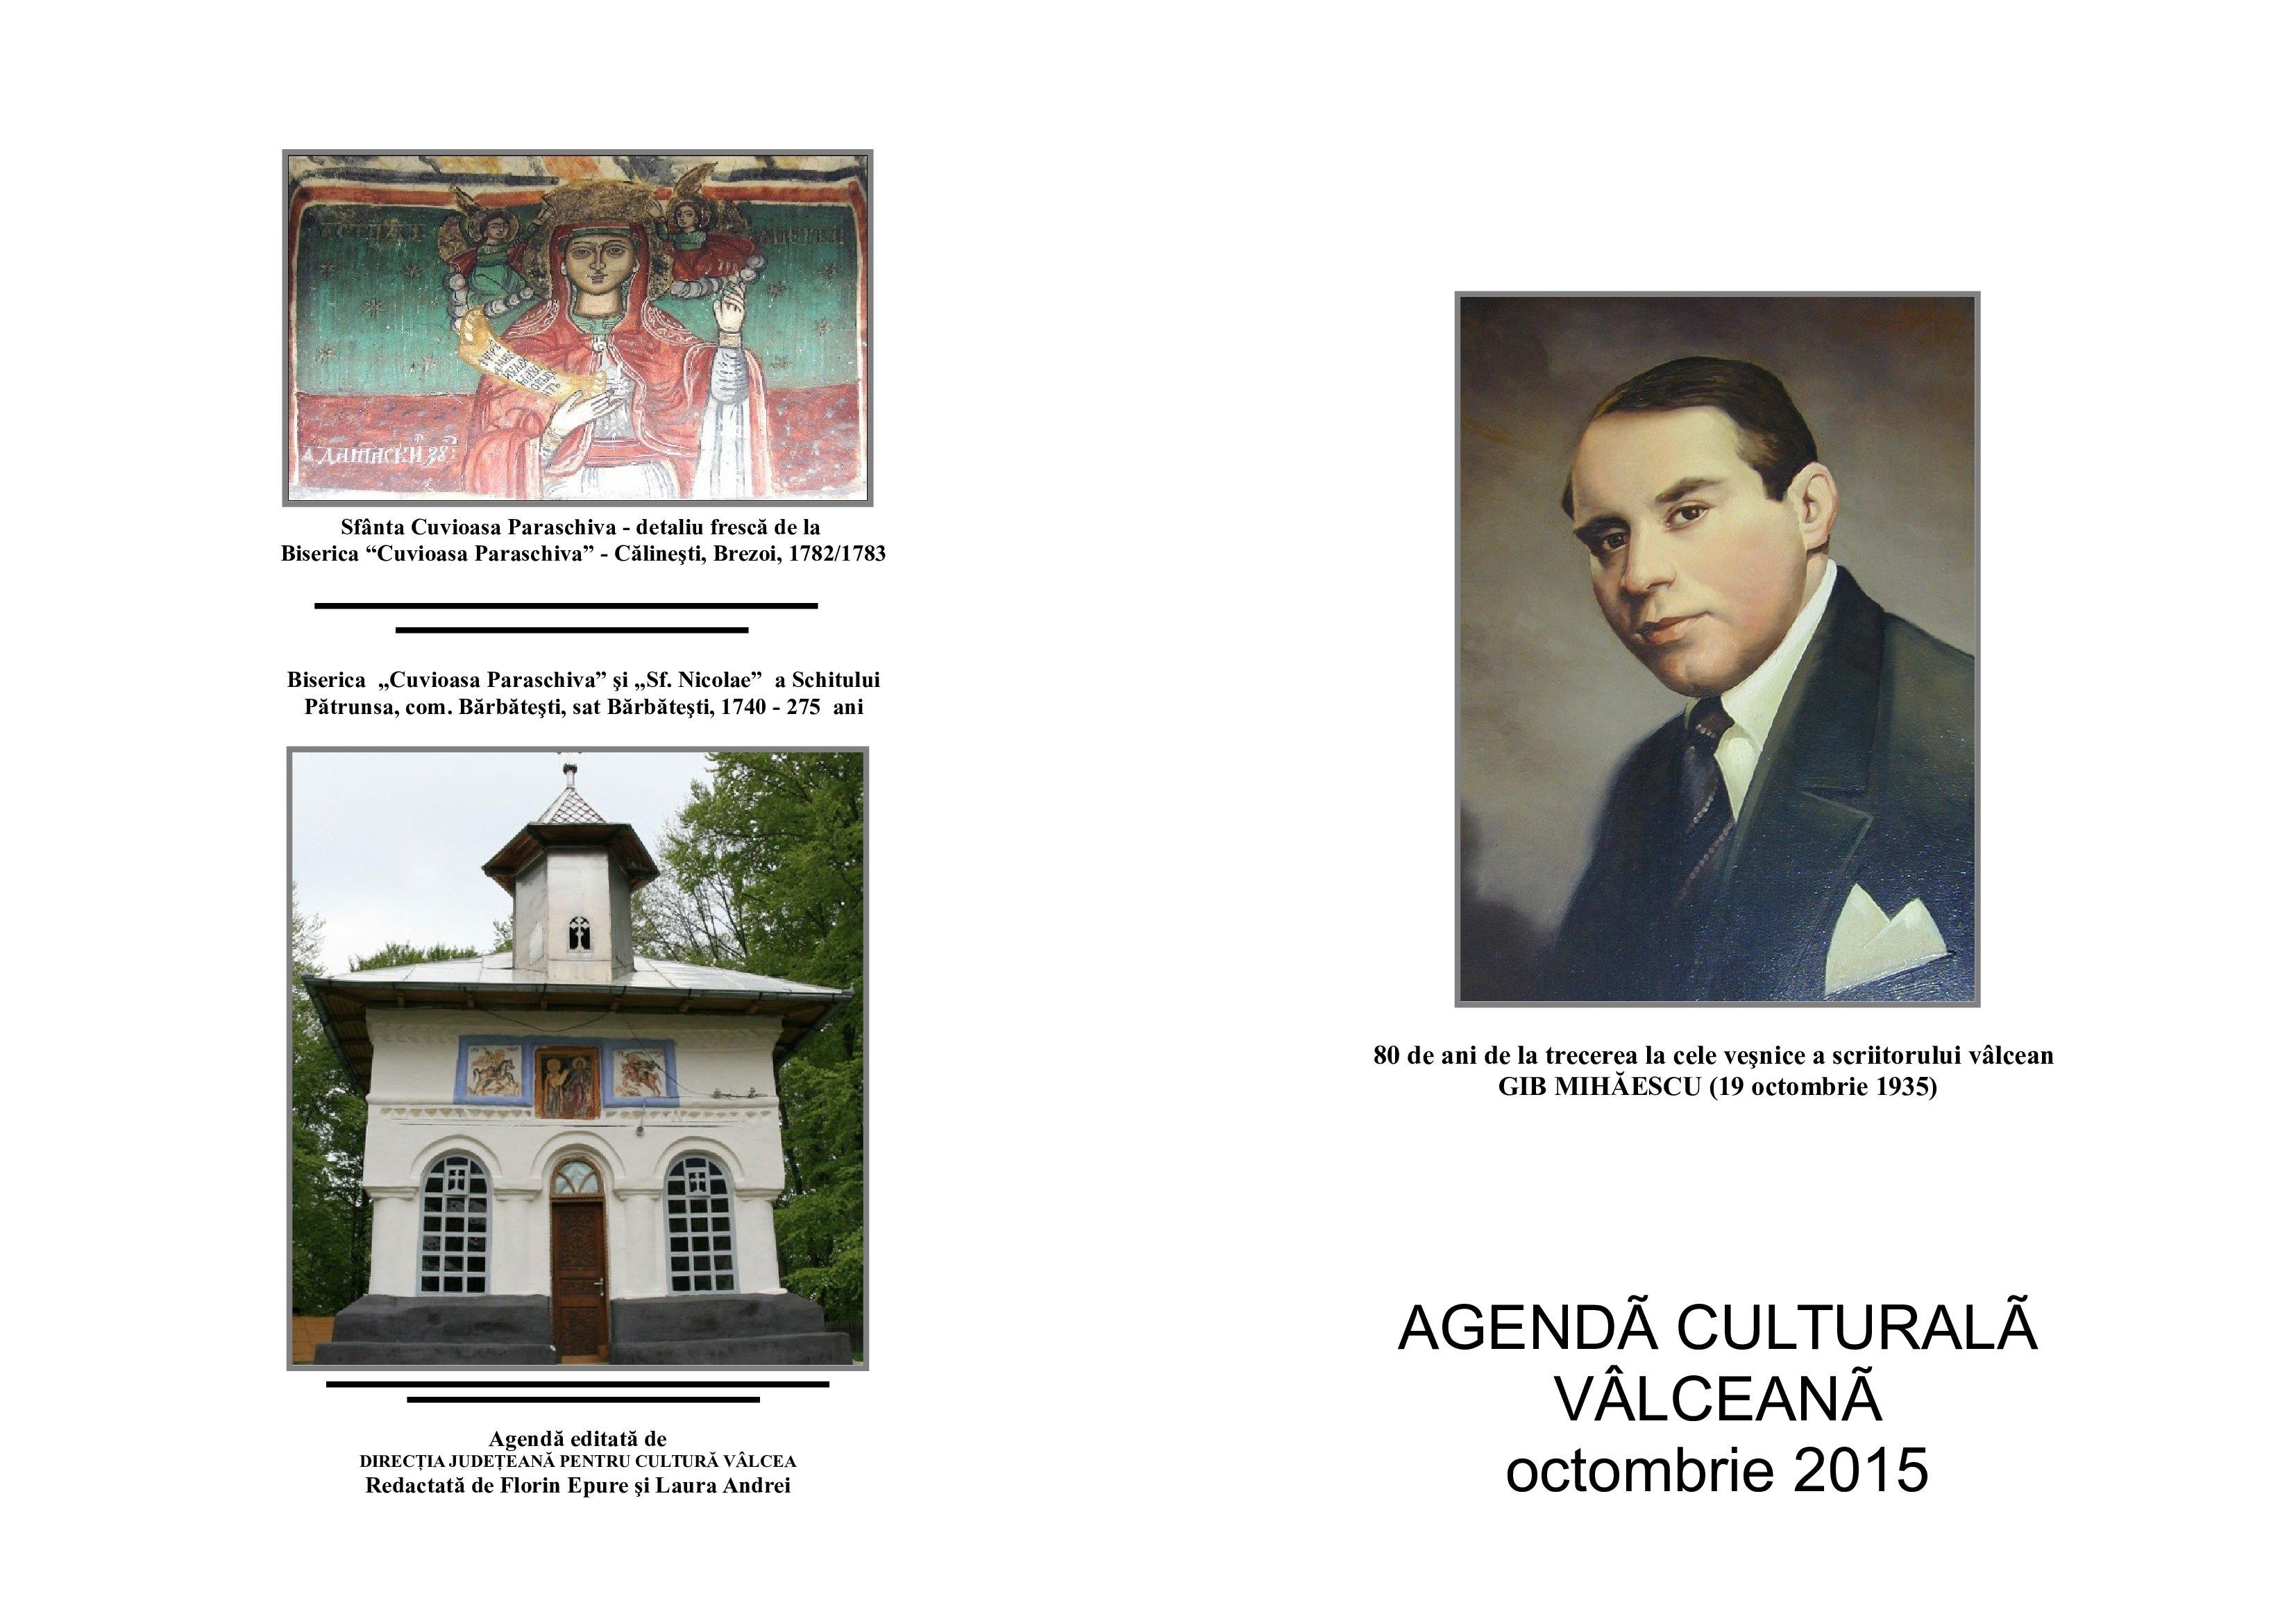 Agenda Culturala Valceana, octombrie 2015